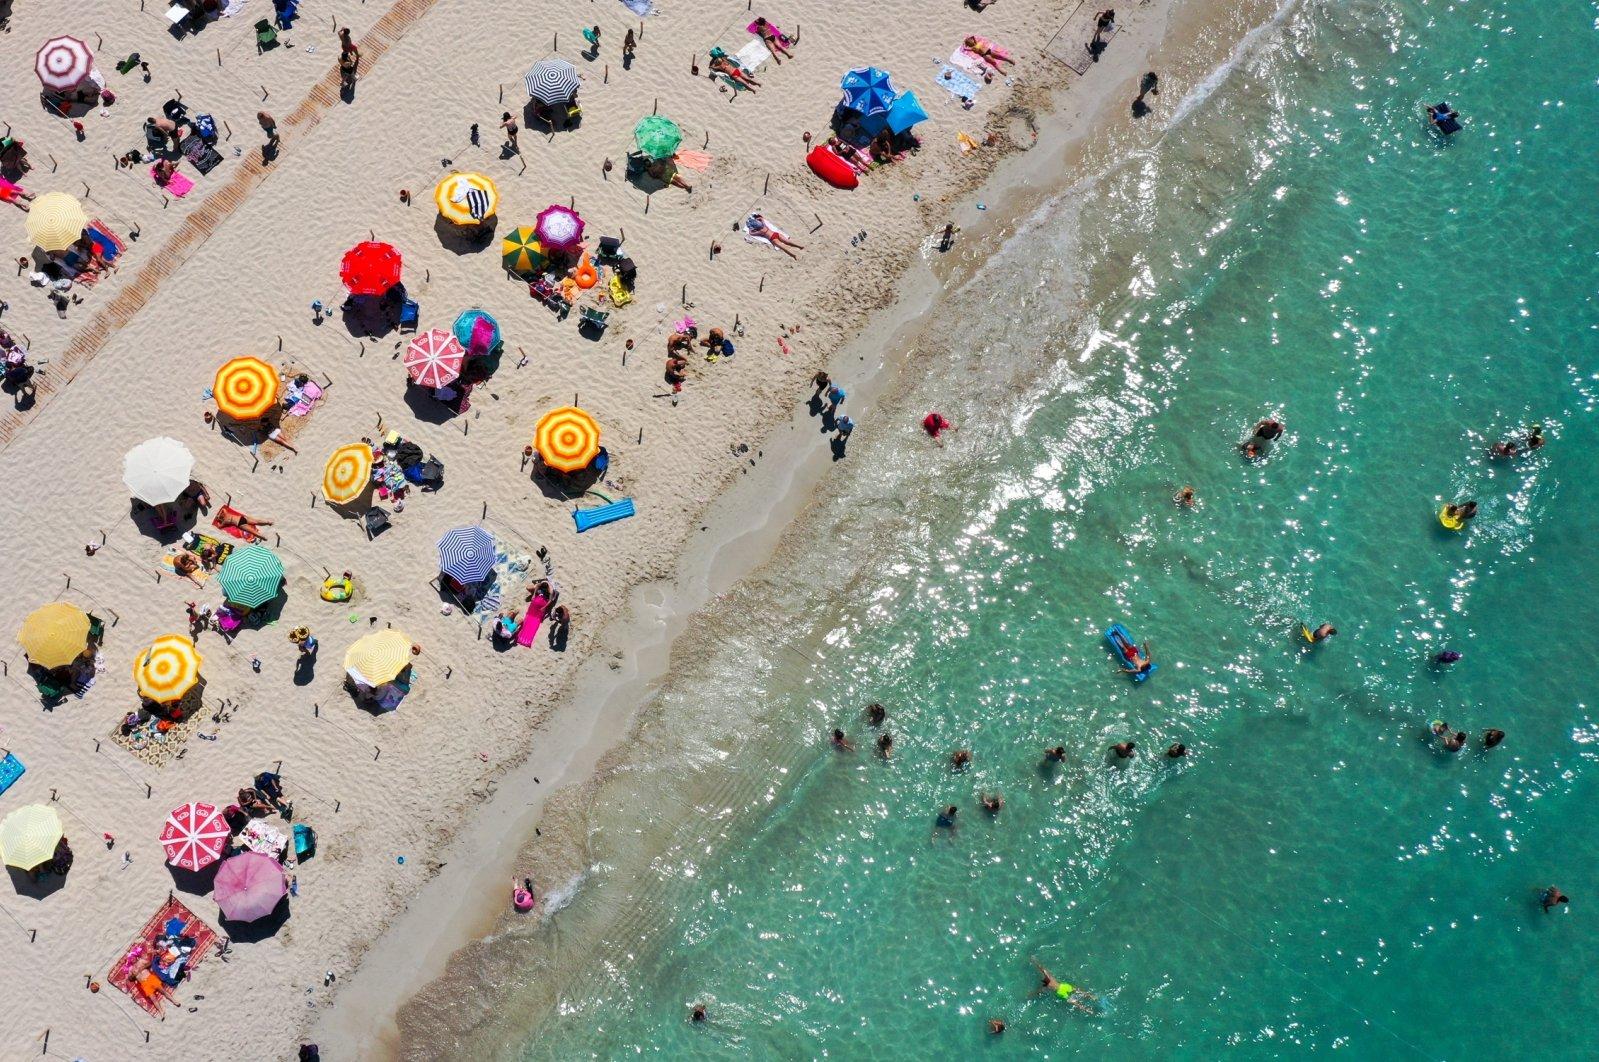 People enjoy the sun at Ilıca Beach in Çeşme, a resort town west of Izmir, in Turkey's Aegean region, July 19, 2020. (AA Photo)